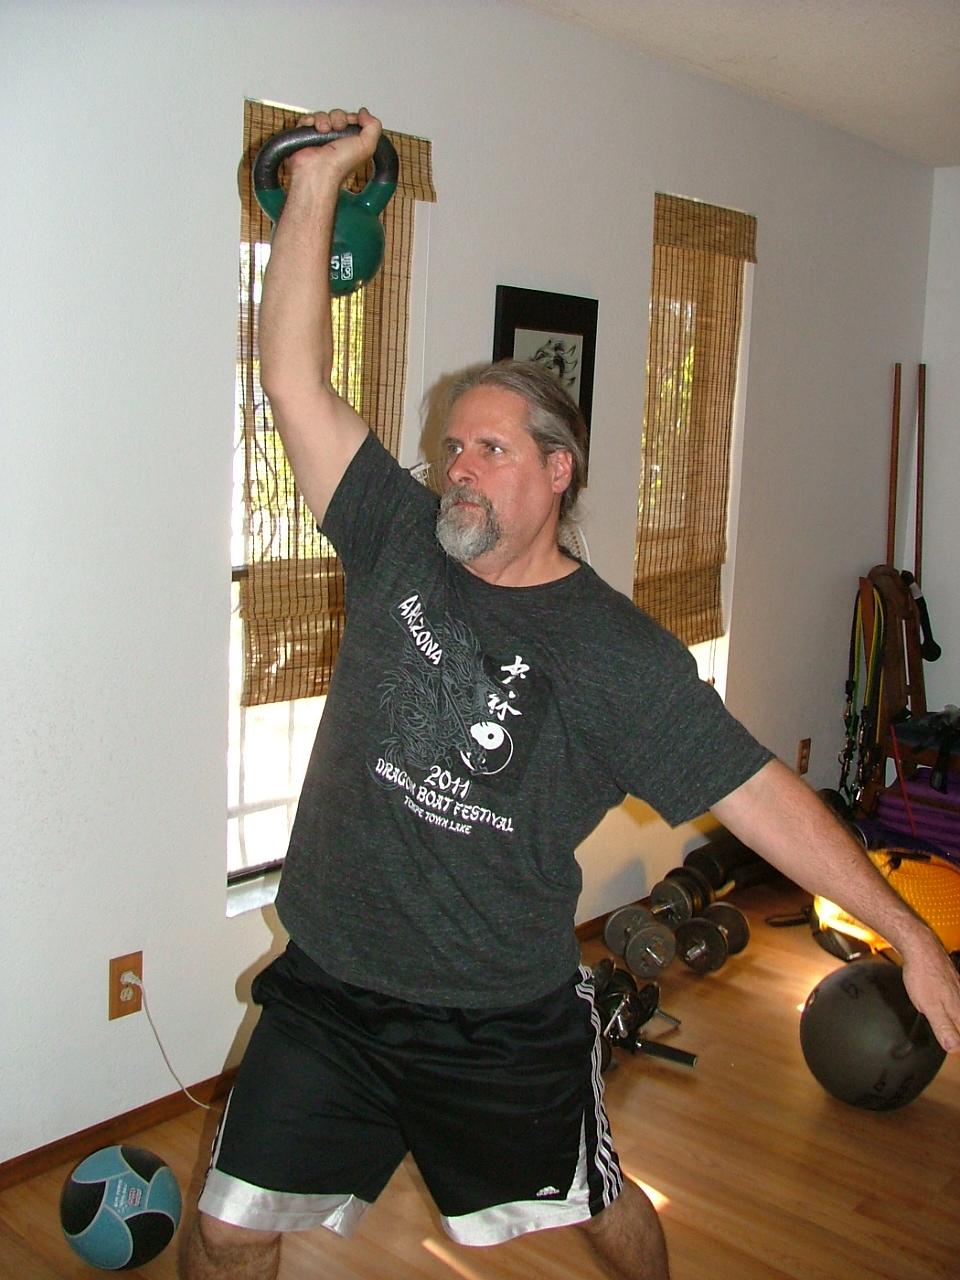 2 X Fitness - health  | Photo 5 of 8 | Address: 1503 N 26th St, Mesa, AZ 85213, USA | Phone: (480) 406-1570